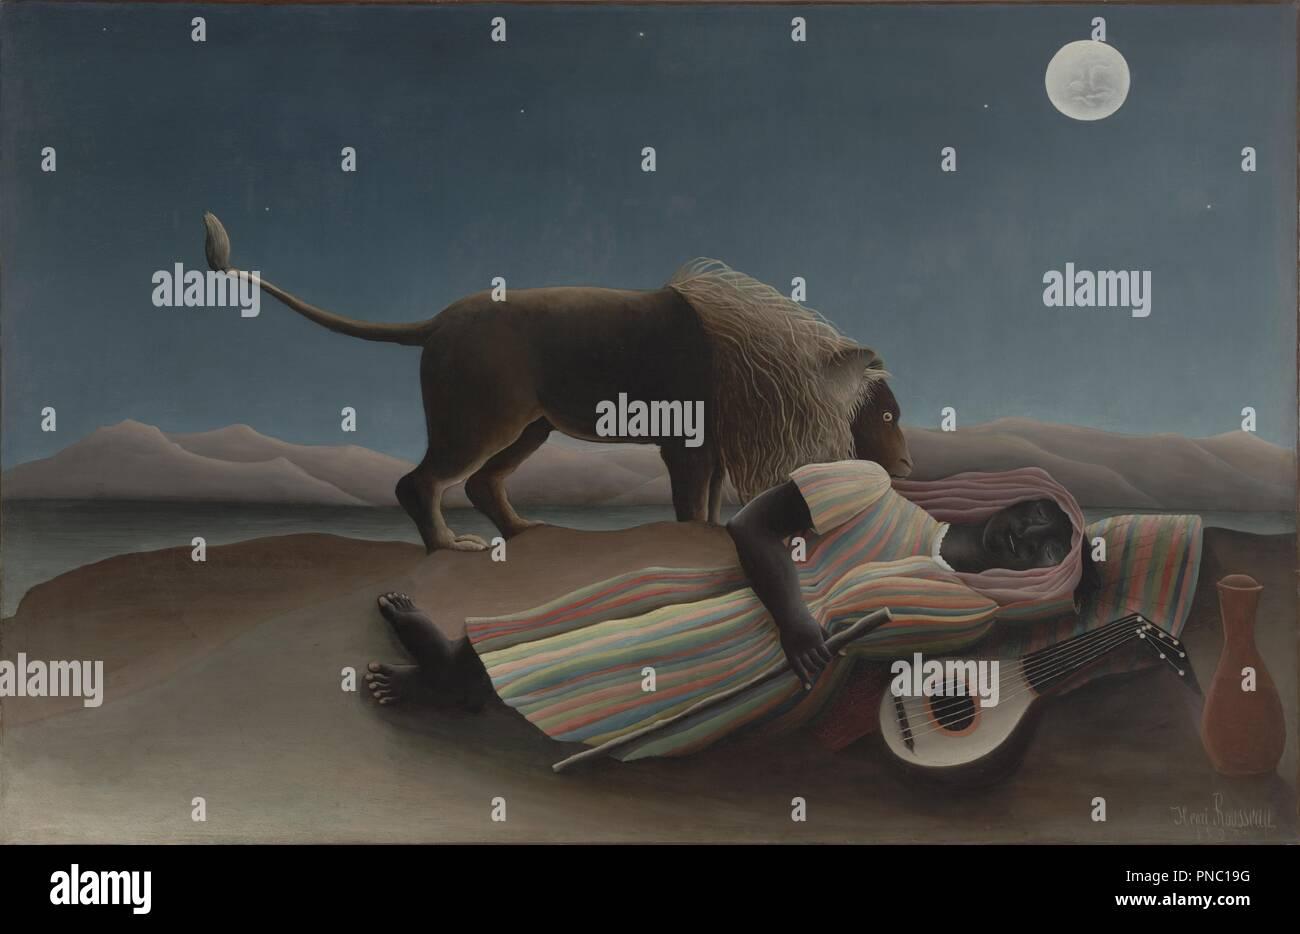 La Bohémienne endormie / Sleeping Gypsy. Data/Periodo: 1897. La pittura. Olio su tela. Altezza: 129,5 cm (50,9 in); larghezza: 200.7 cm (79 in). Autore: Henri Rousseau. ROUSSEAU, Henri. Rousseau, Henri Julien Félix. Immagini Stock